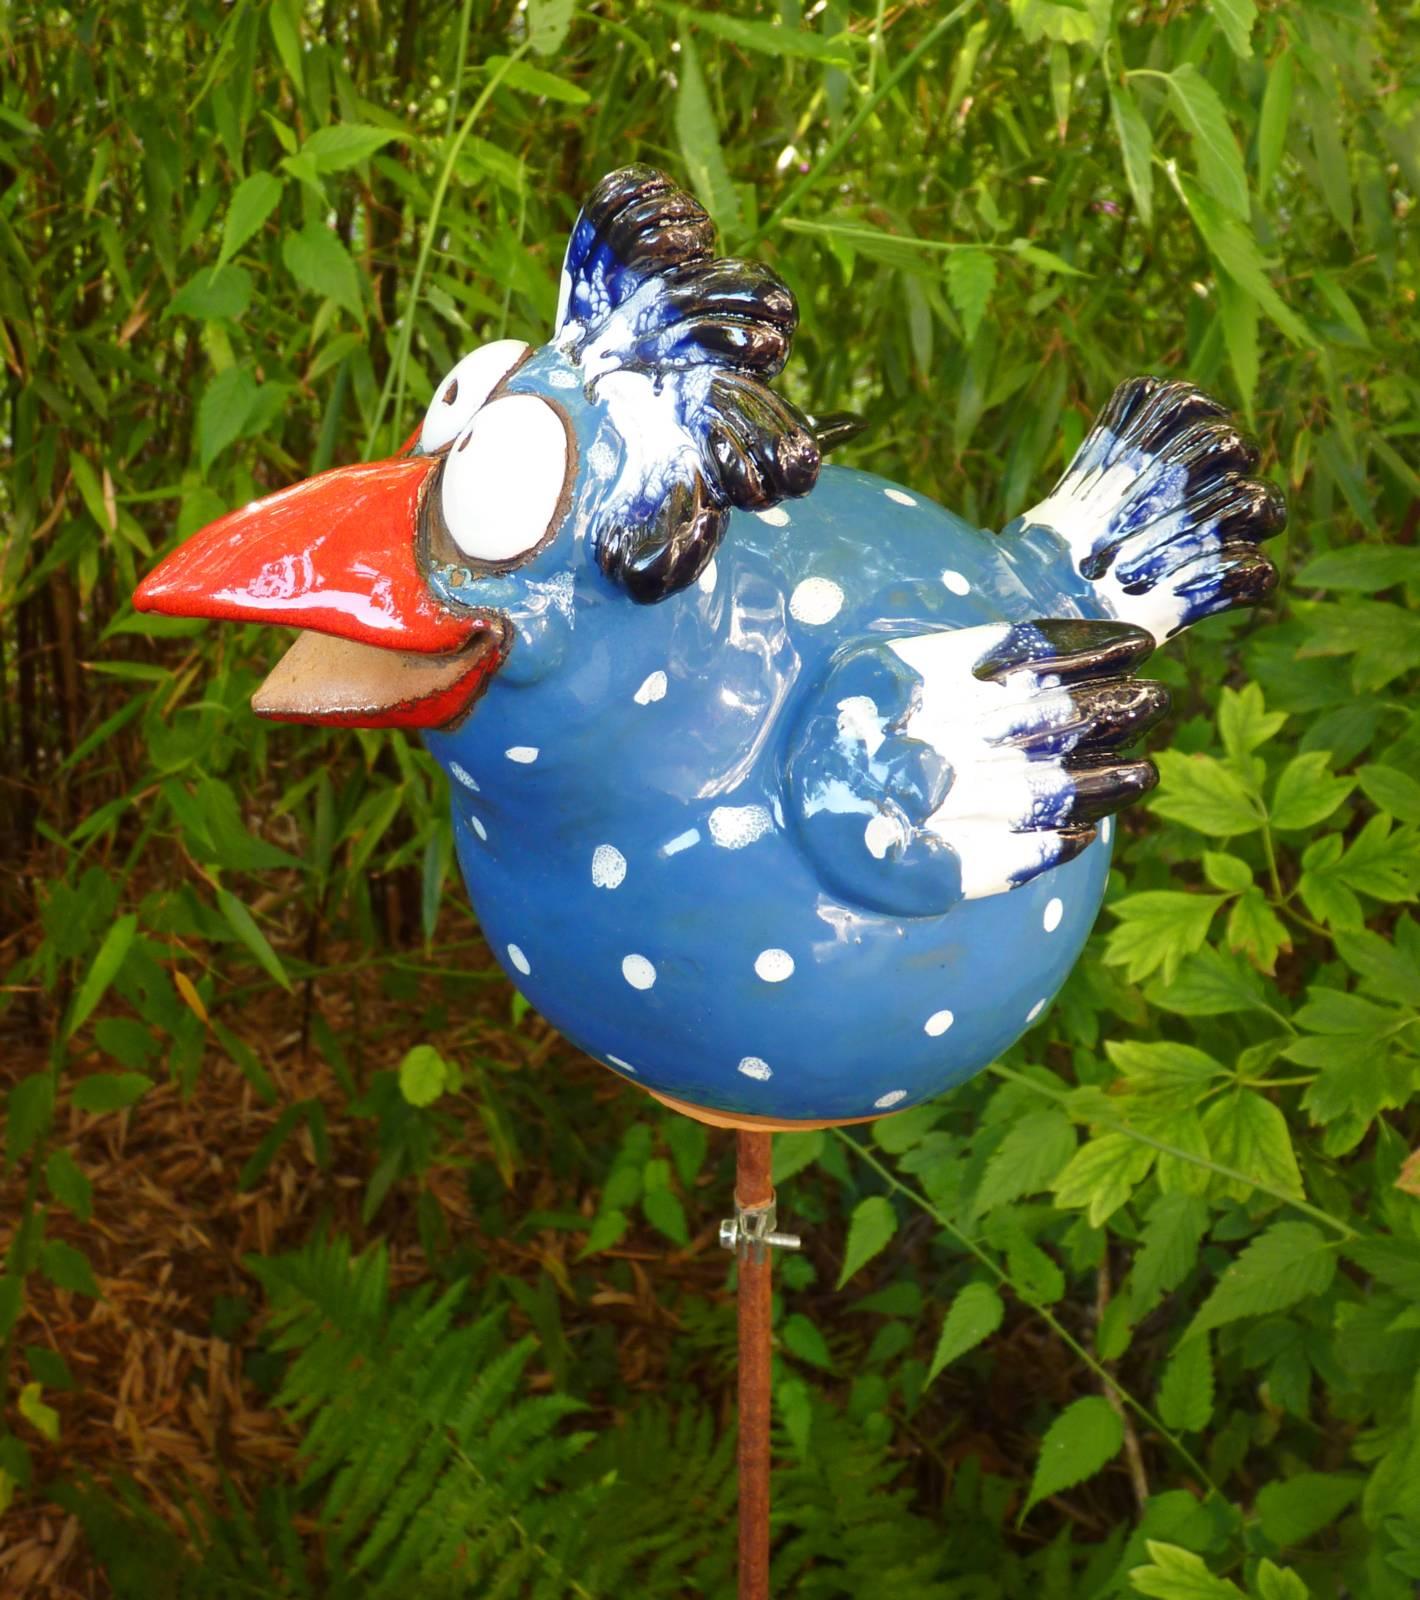 gartenstecker beetstecker fantasie vogel hahn keramik blau gartendeko frostfest ebay. Black Bedroom Furniture Sets. Home Design Ideas